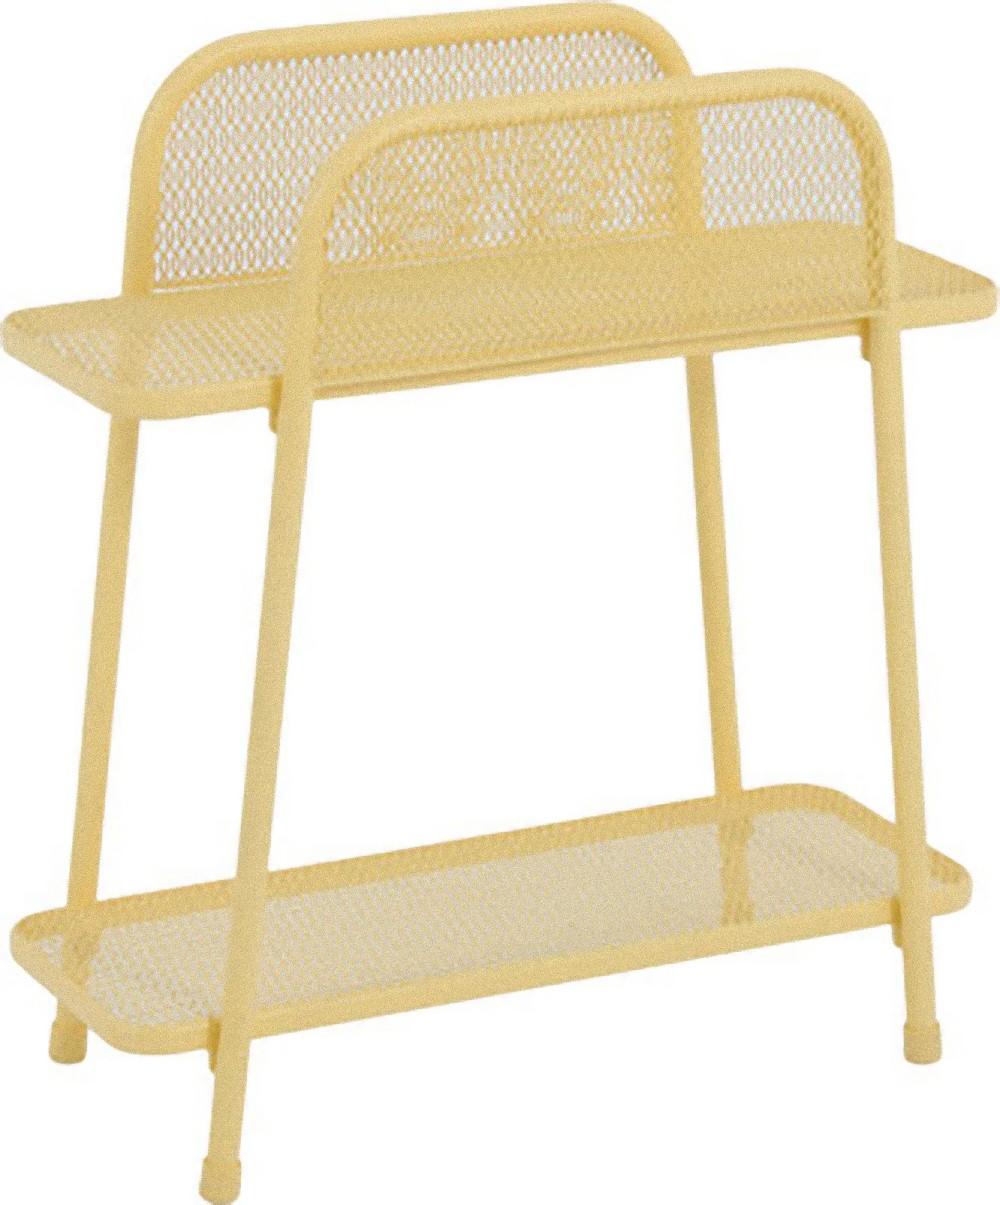 metall balkonregal gelb balkon garten terrasse regal. Black Bedroom Furniture Sets. Home Design Ideas